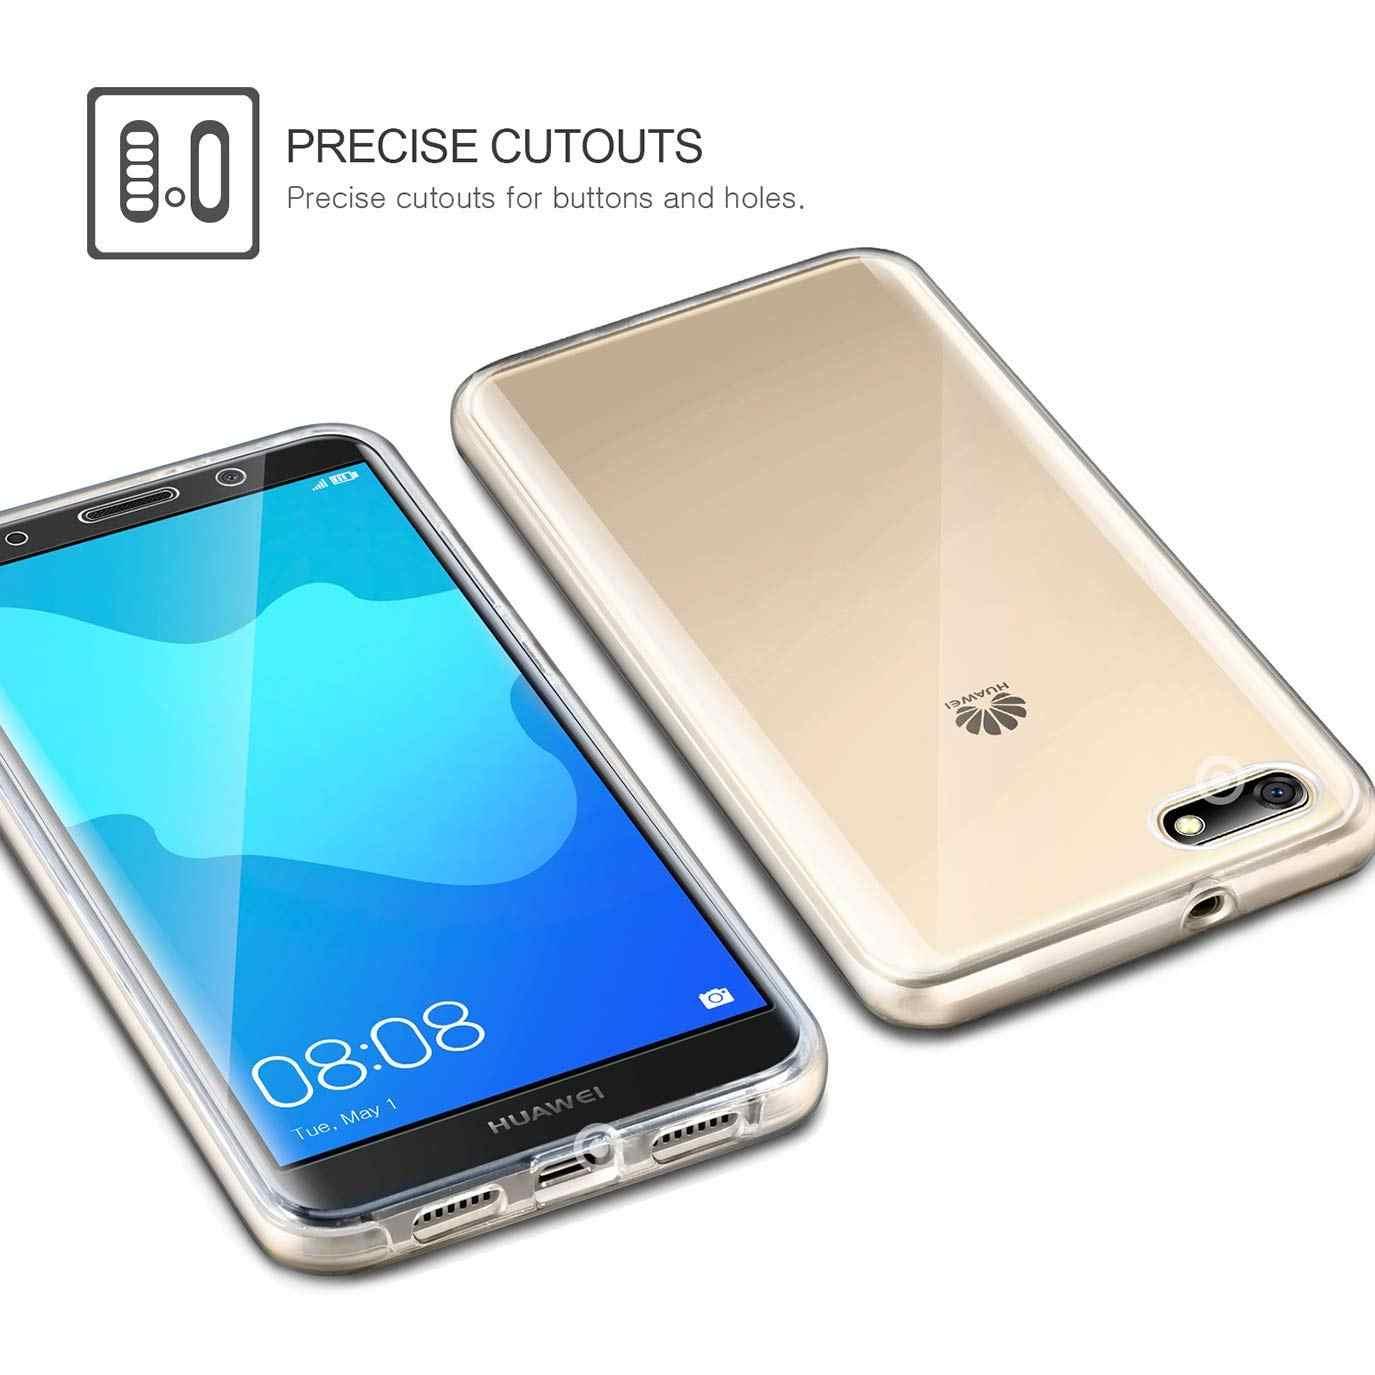 עבור Huawei P40 P20 P30 נובה 3 3i Y6P כבוד Mate 10 20 פרו 8X לייט 360 תואר שקוף מלא גוף רך סיליקון TPU Case כיסוי